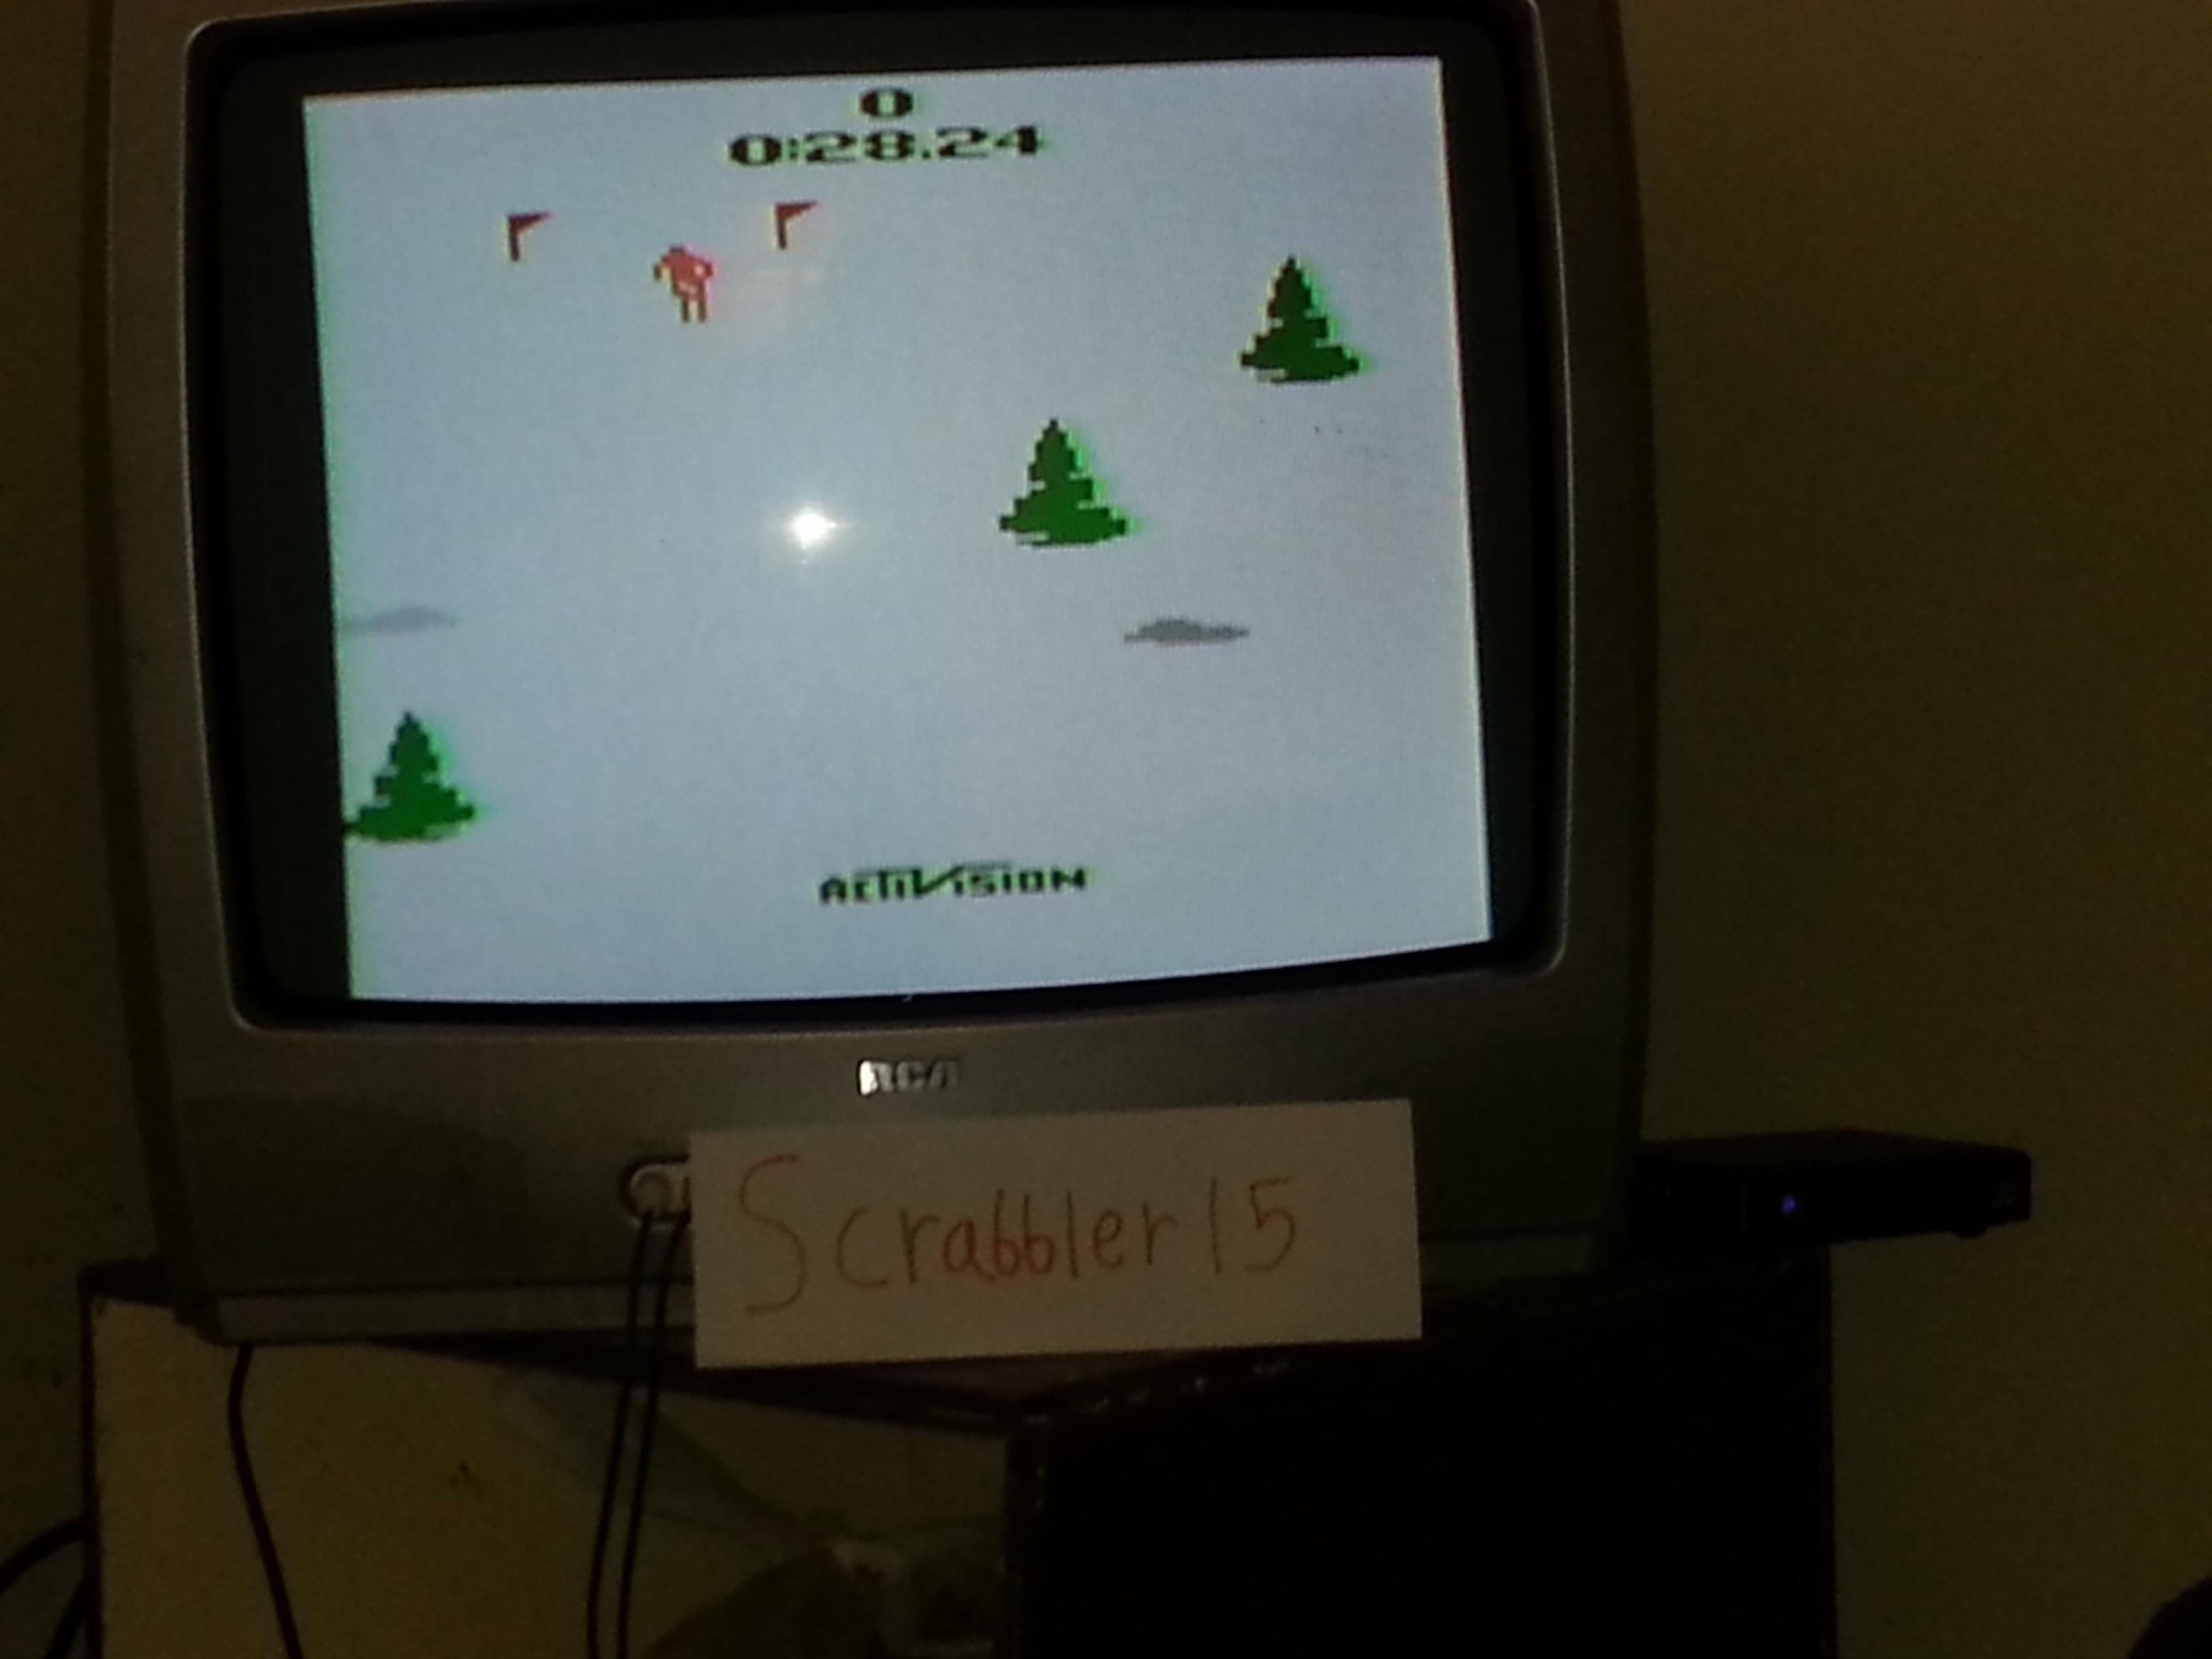 Scrabbler15: Skiing: Game 3 (Atari 2600 Novice/B) 0:00:28.24 points on 2014-10-08 15:58:21